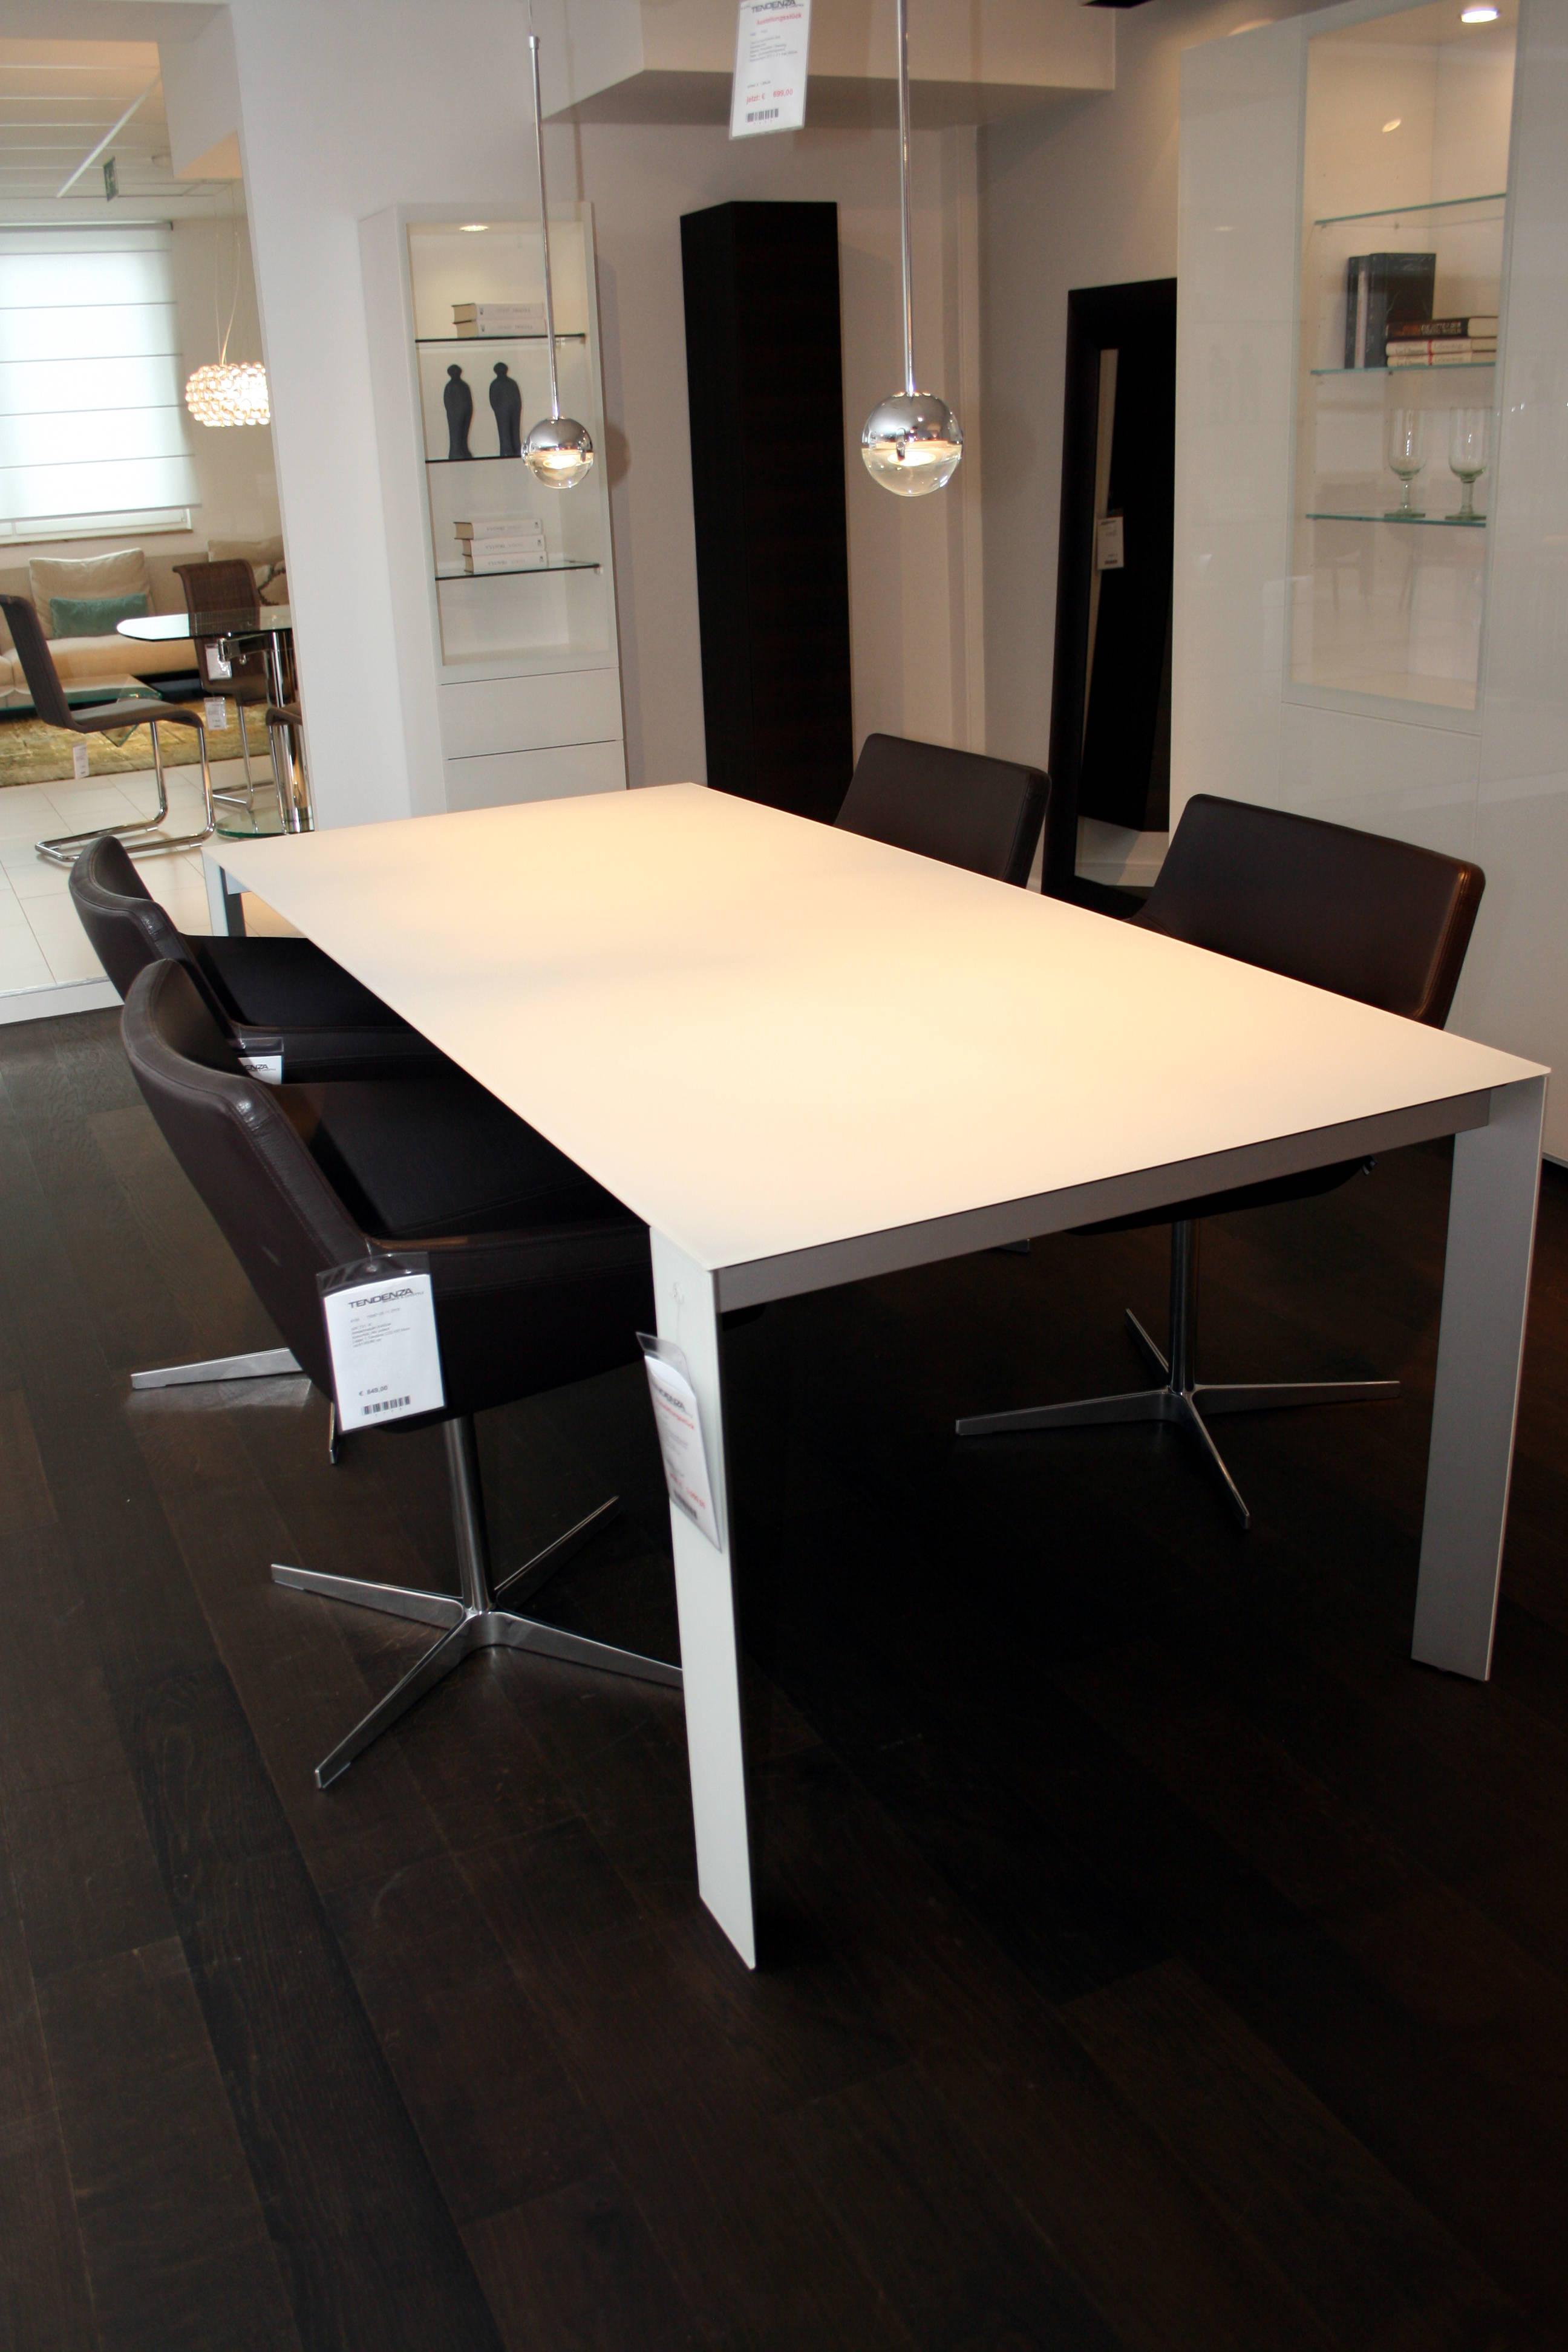 sale in f rth tisch soma von kettnaker. Black Bedroom Furniture Sets. Home Design Ideas